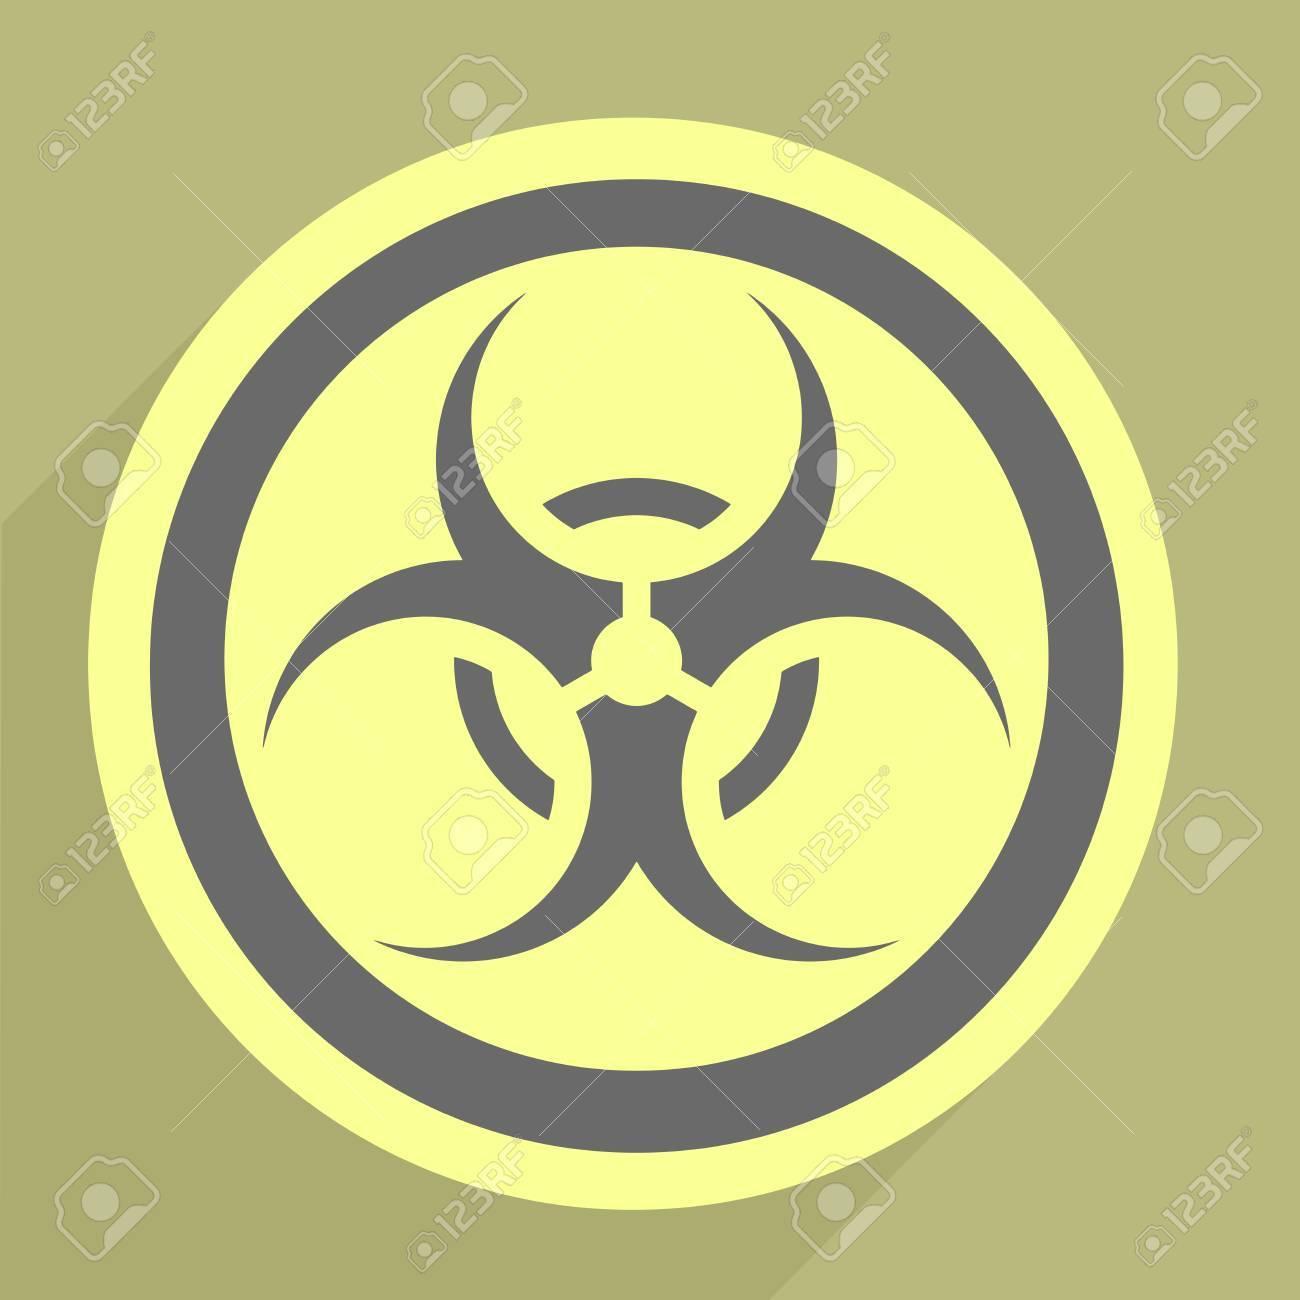 minimalistic illustration of a biohazard icon Stock Vector - 26395377